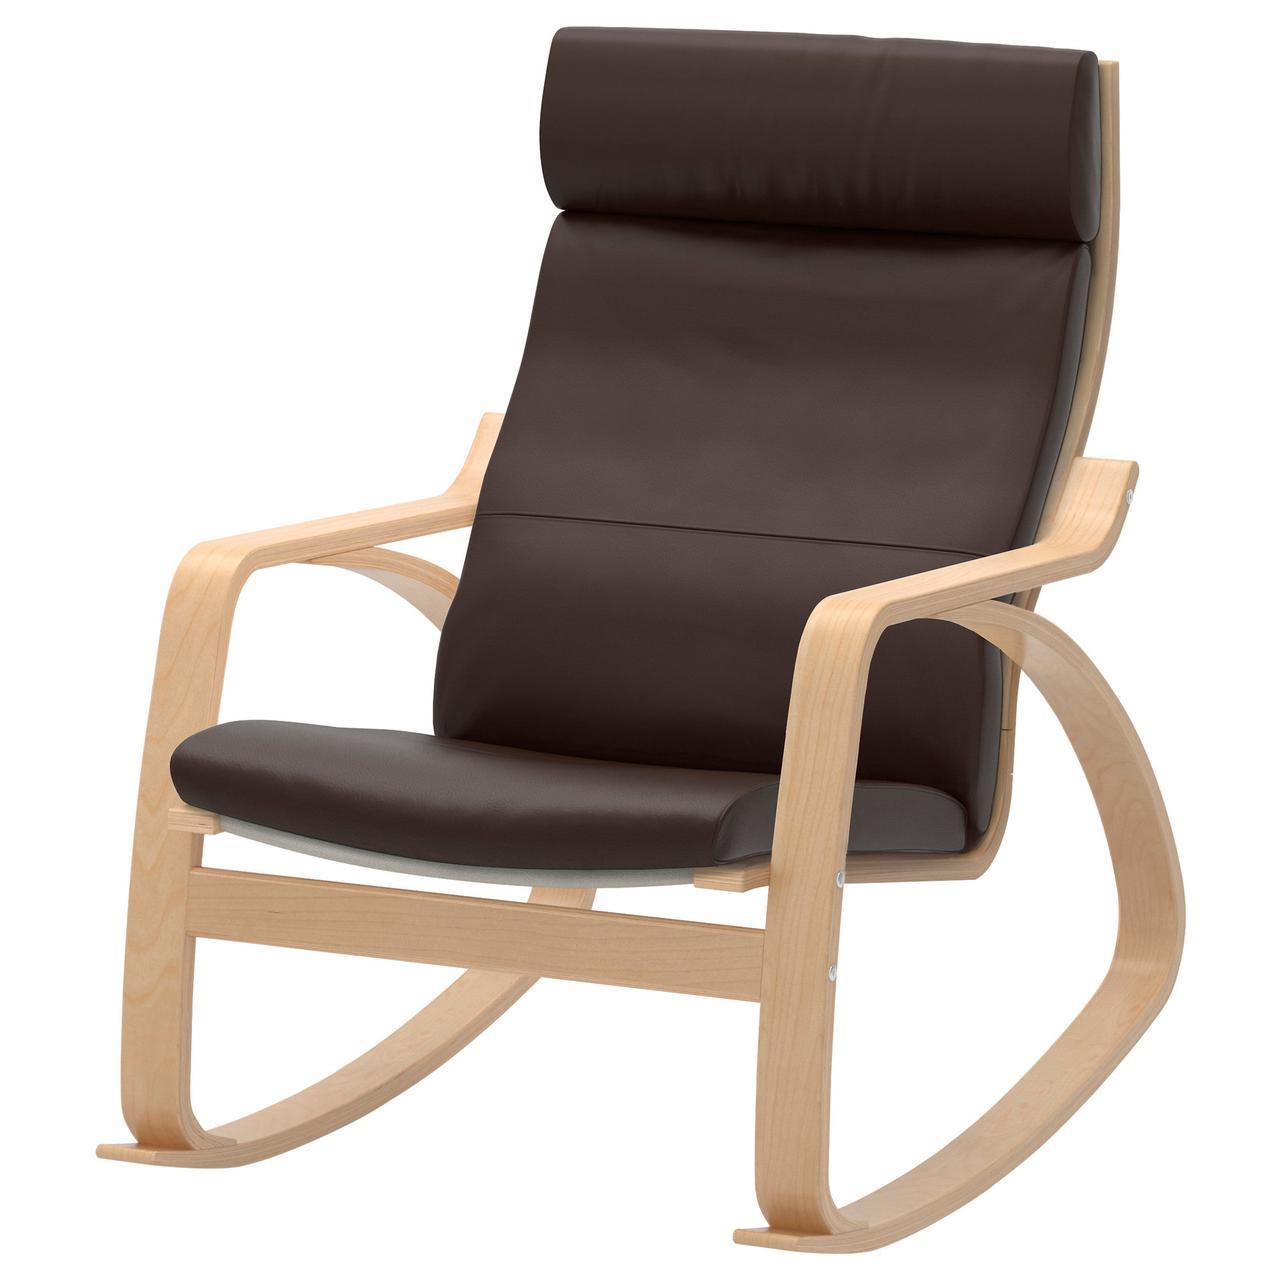 ✅ IKEA POANG (498.610.07) Качающийся стул, ok birches, Robust Glose ecru